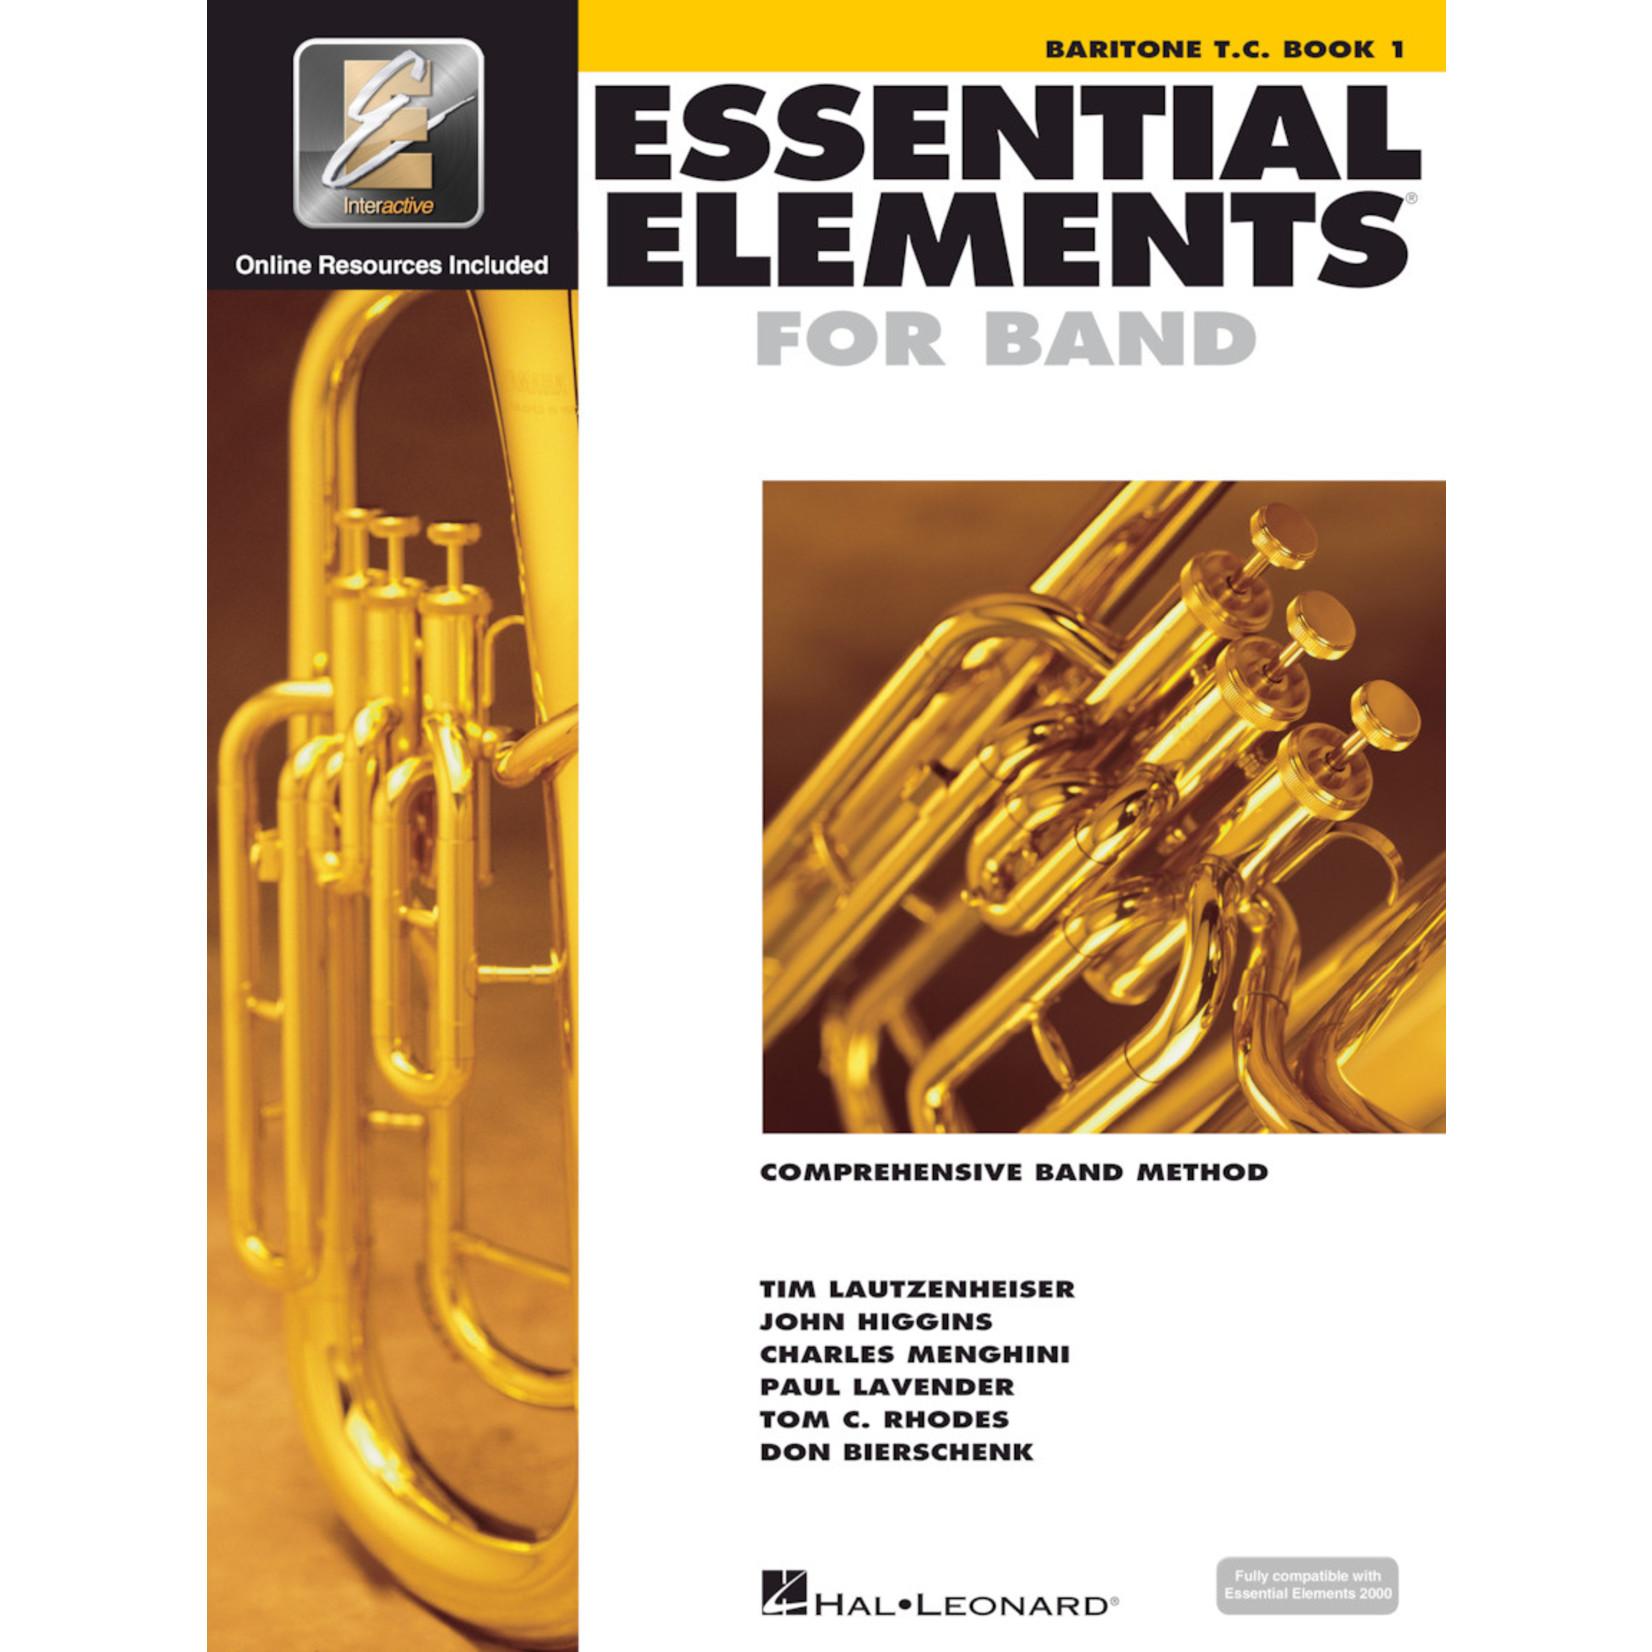 Hal Leonard Essential Elements for Band Baritone Tenor Clef Book 1